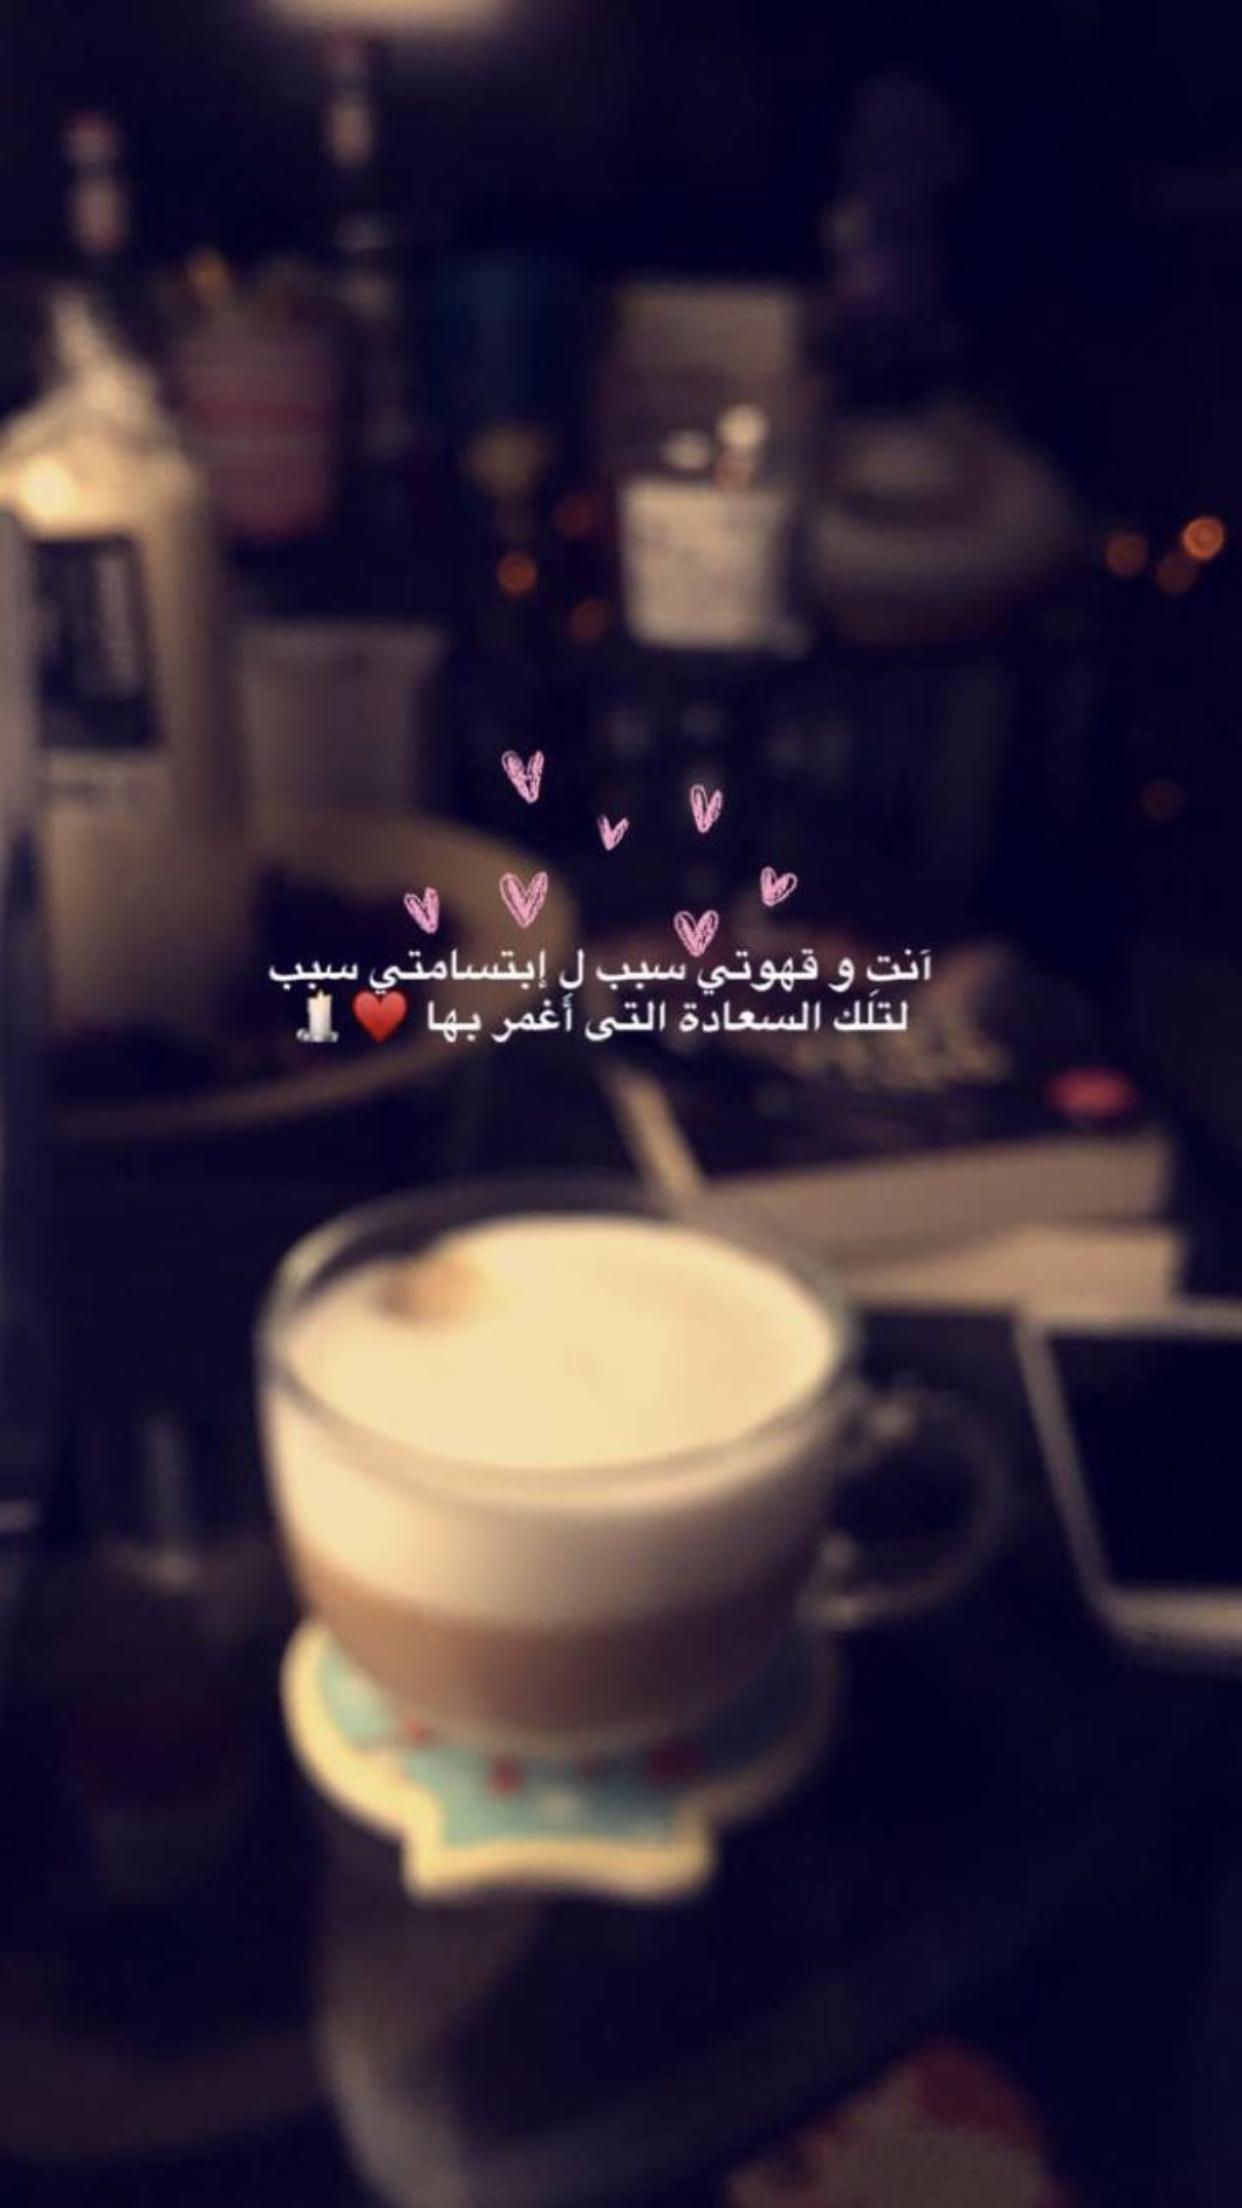 Pin By Fatima Zakarya On سناب موضي البليهد Beautiful Quran Quotes Iphone Wallpaper Quotes Love Arabic Quotes